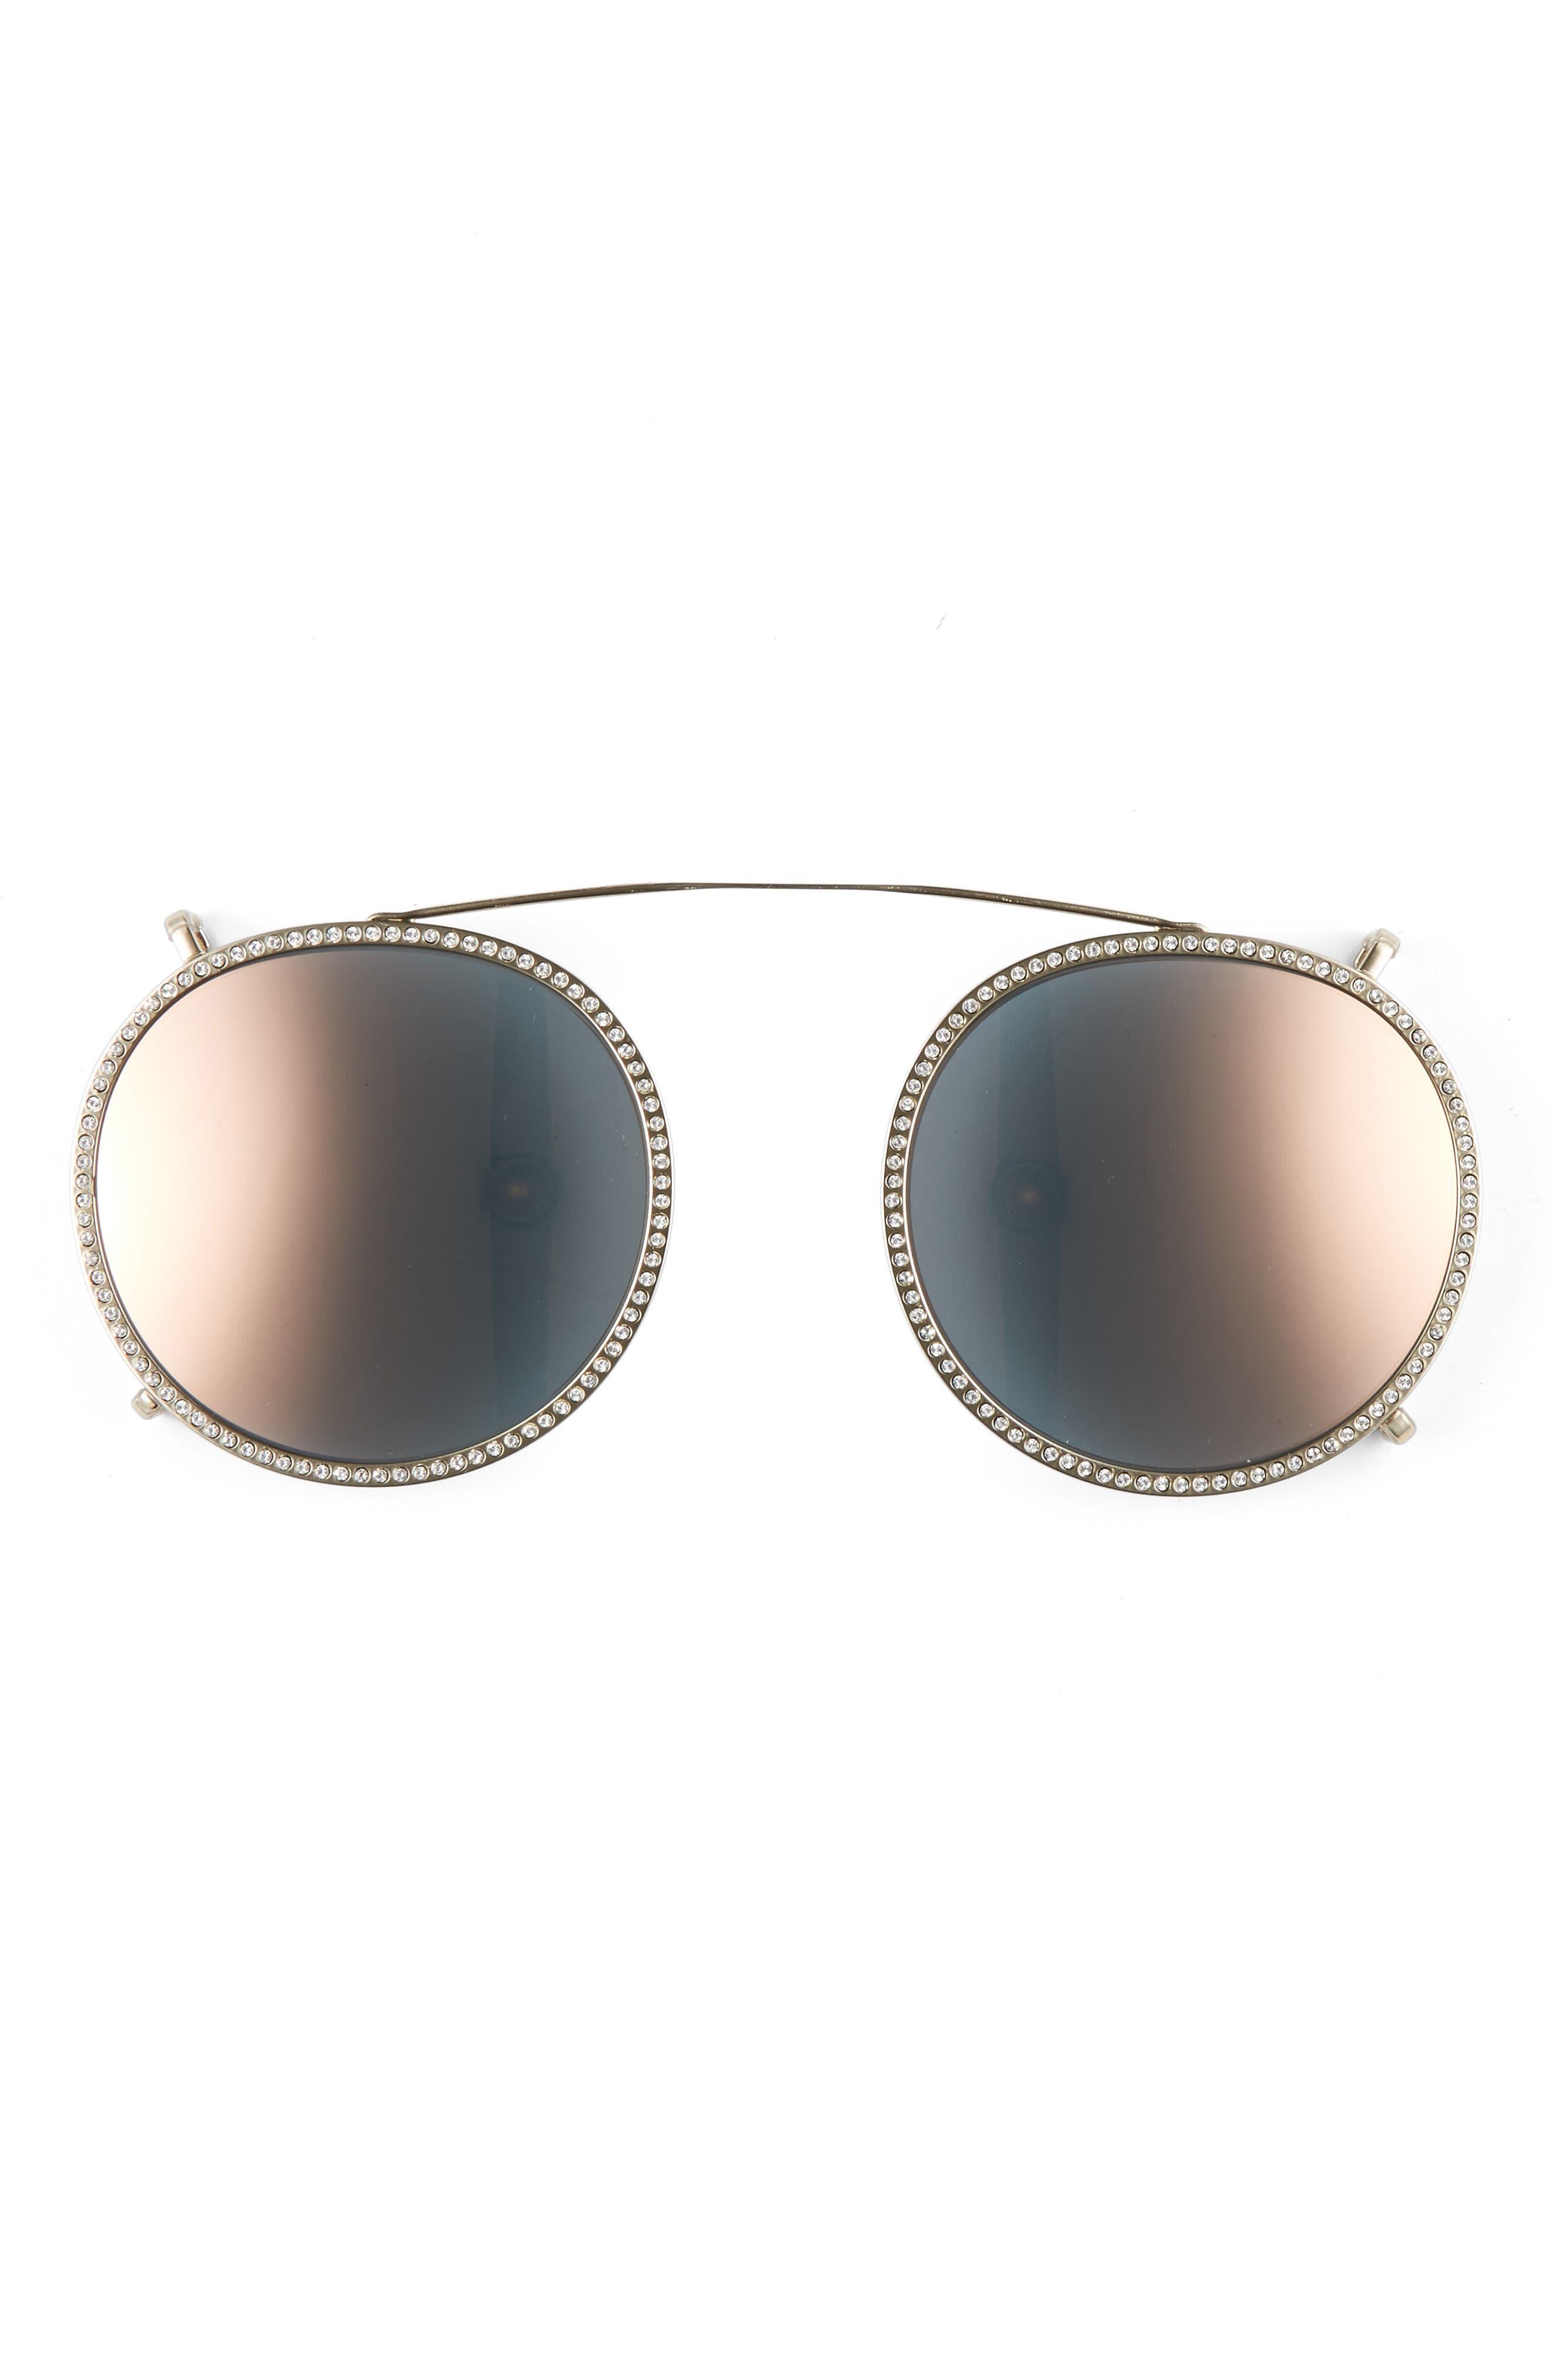 47mm Round Sunglasses,                             Alternate thumbnail 9, color,